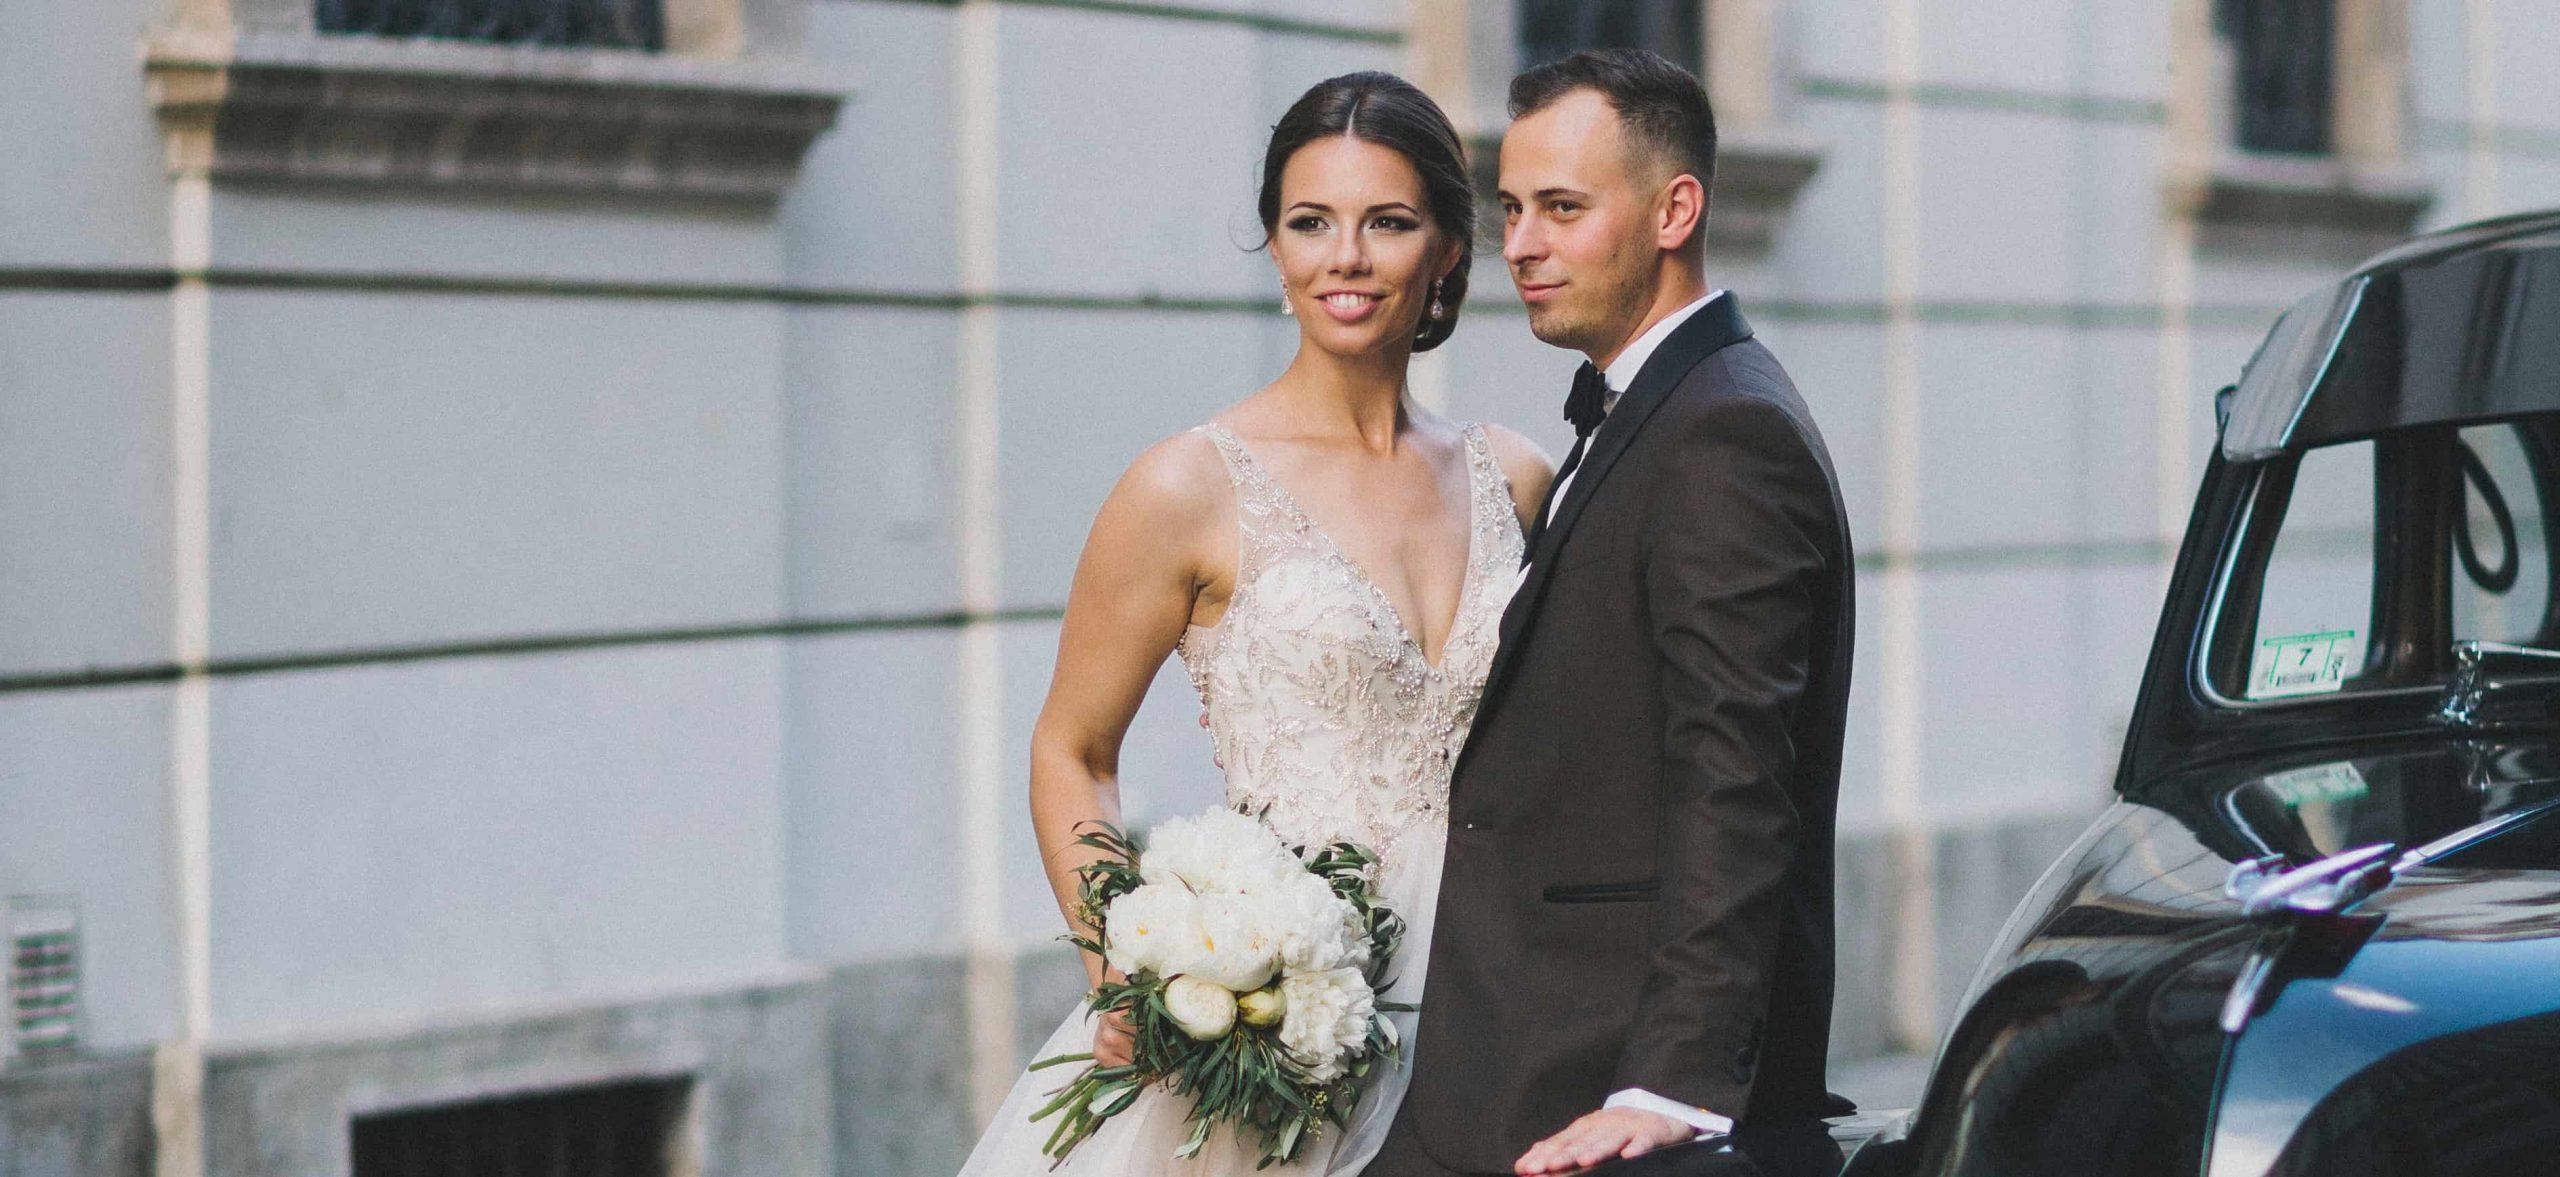 svadobny blog svadba podla tanicky